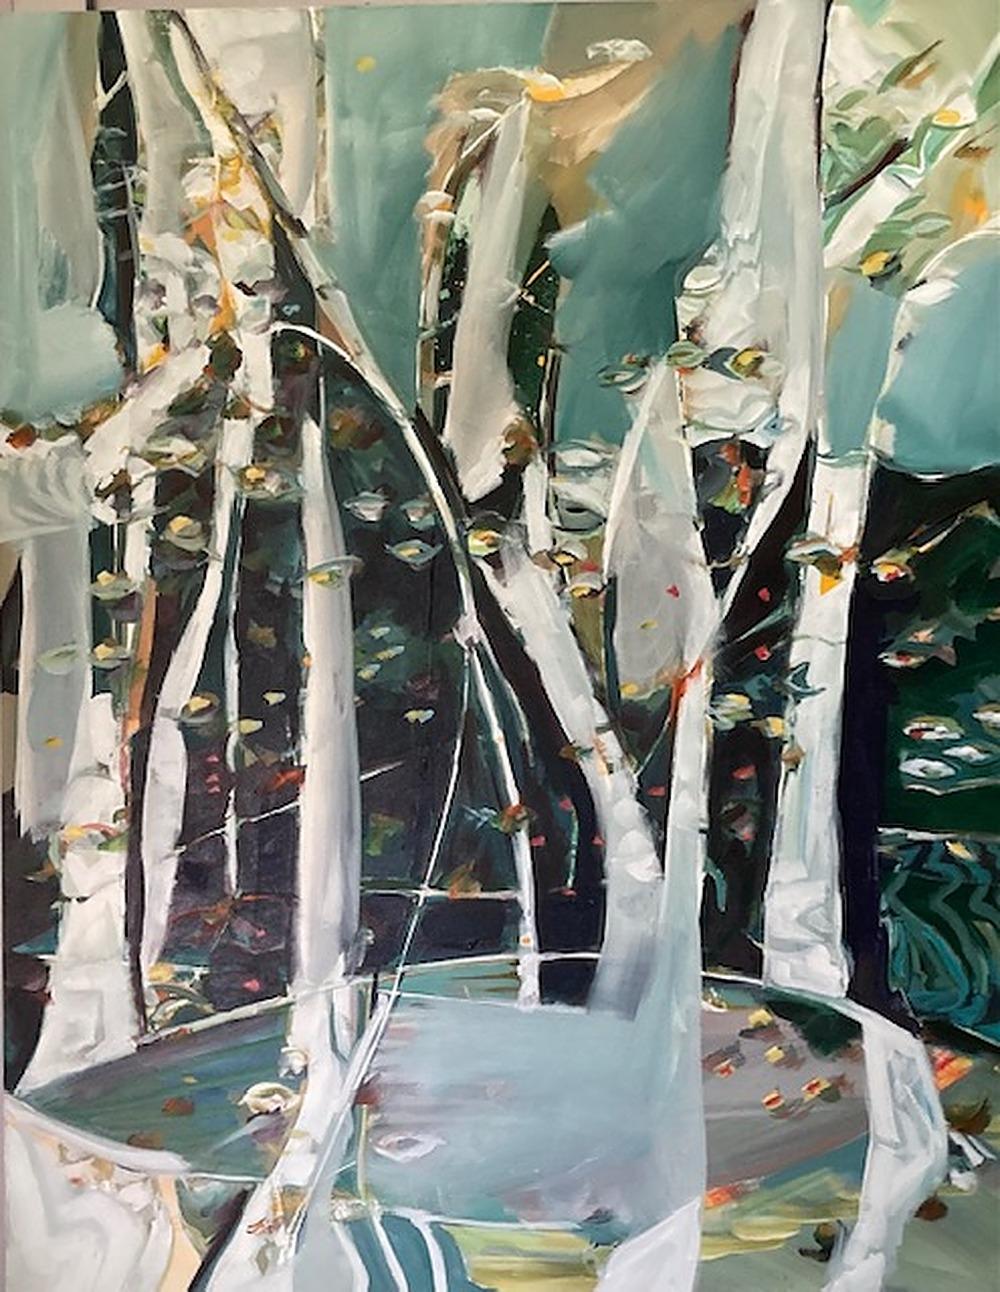 Aspen 42 by Kevan Krasnoff | ArtworkNetwork.com